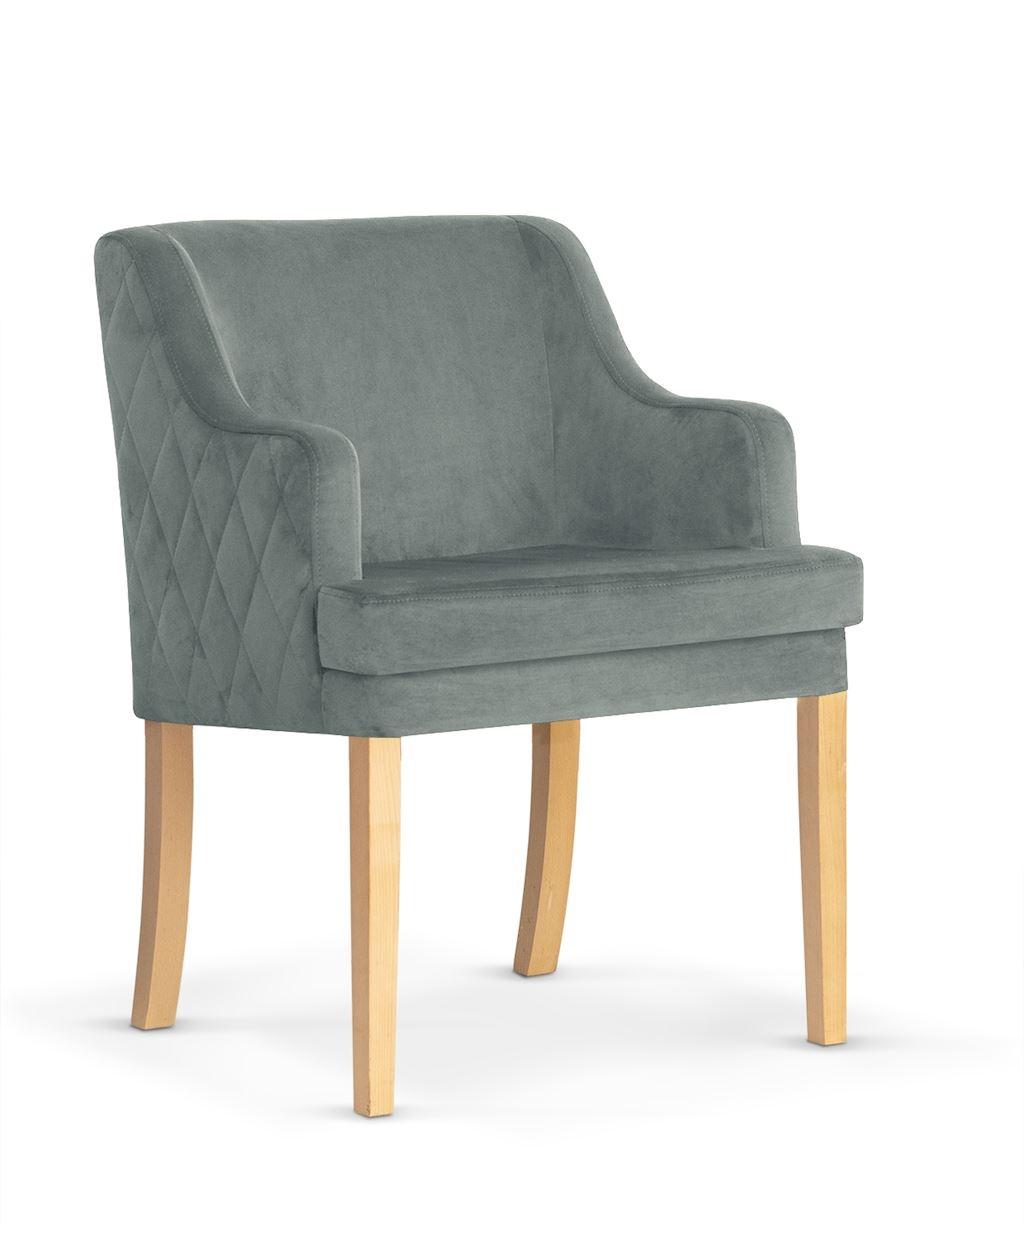 Fotoliu fix tapitat cu stofa, cu picioare din lemn Grand Grey / Oak, l58xA60xH89 cm imagine